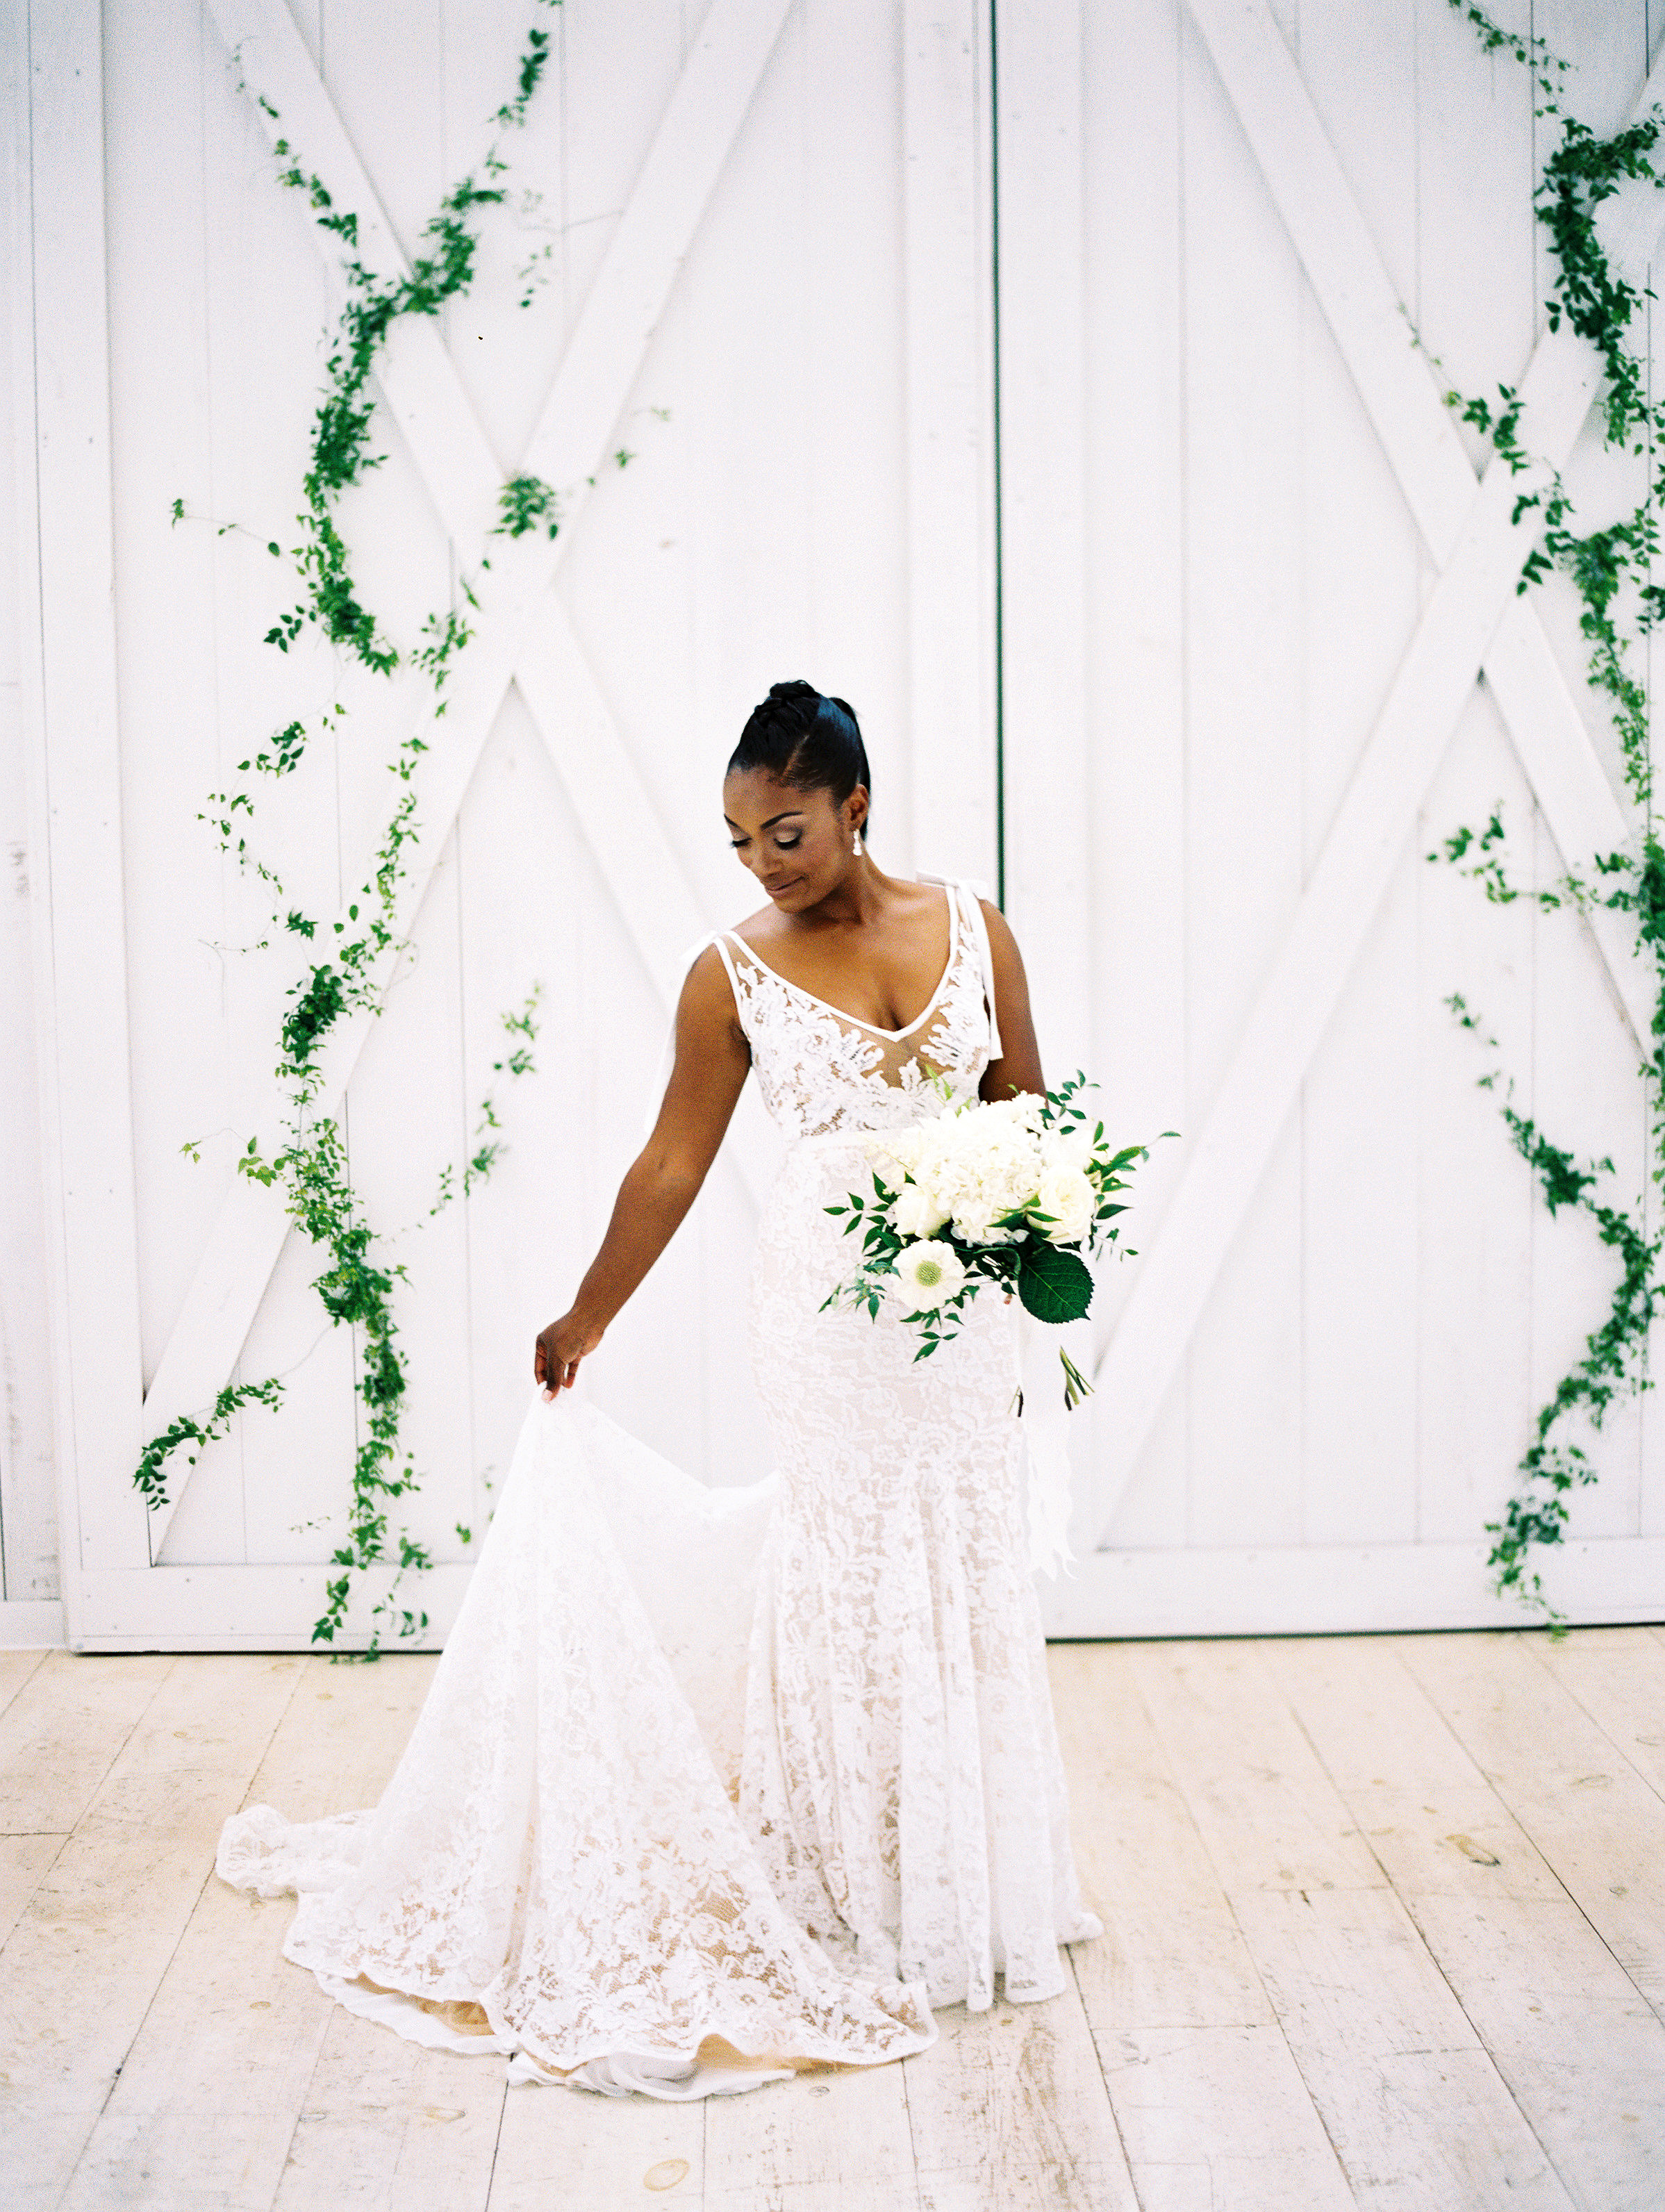 shakira travis wedding bride bouquet dress